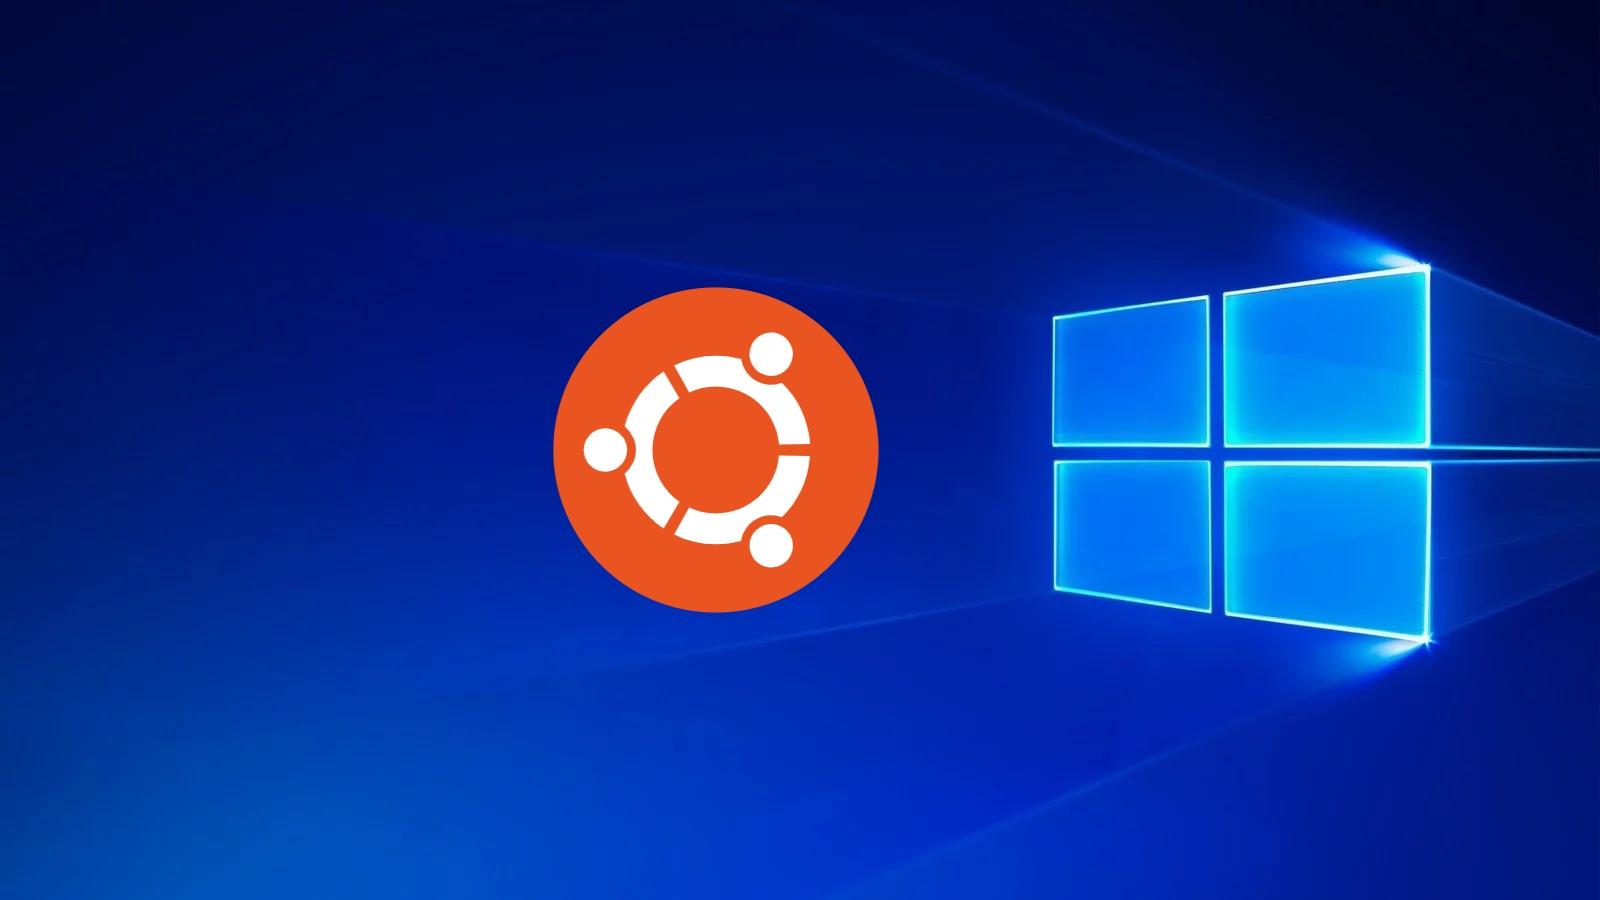 Install Ubuntu from USB in Windows 10